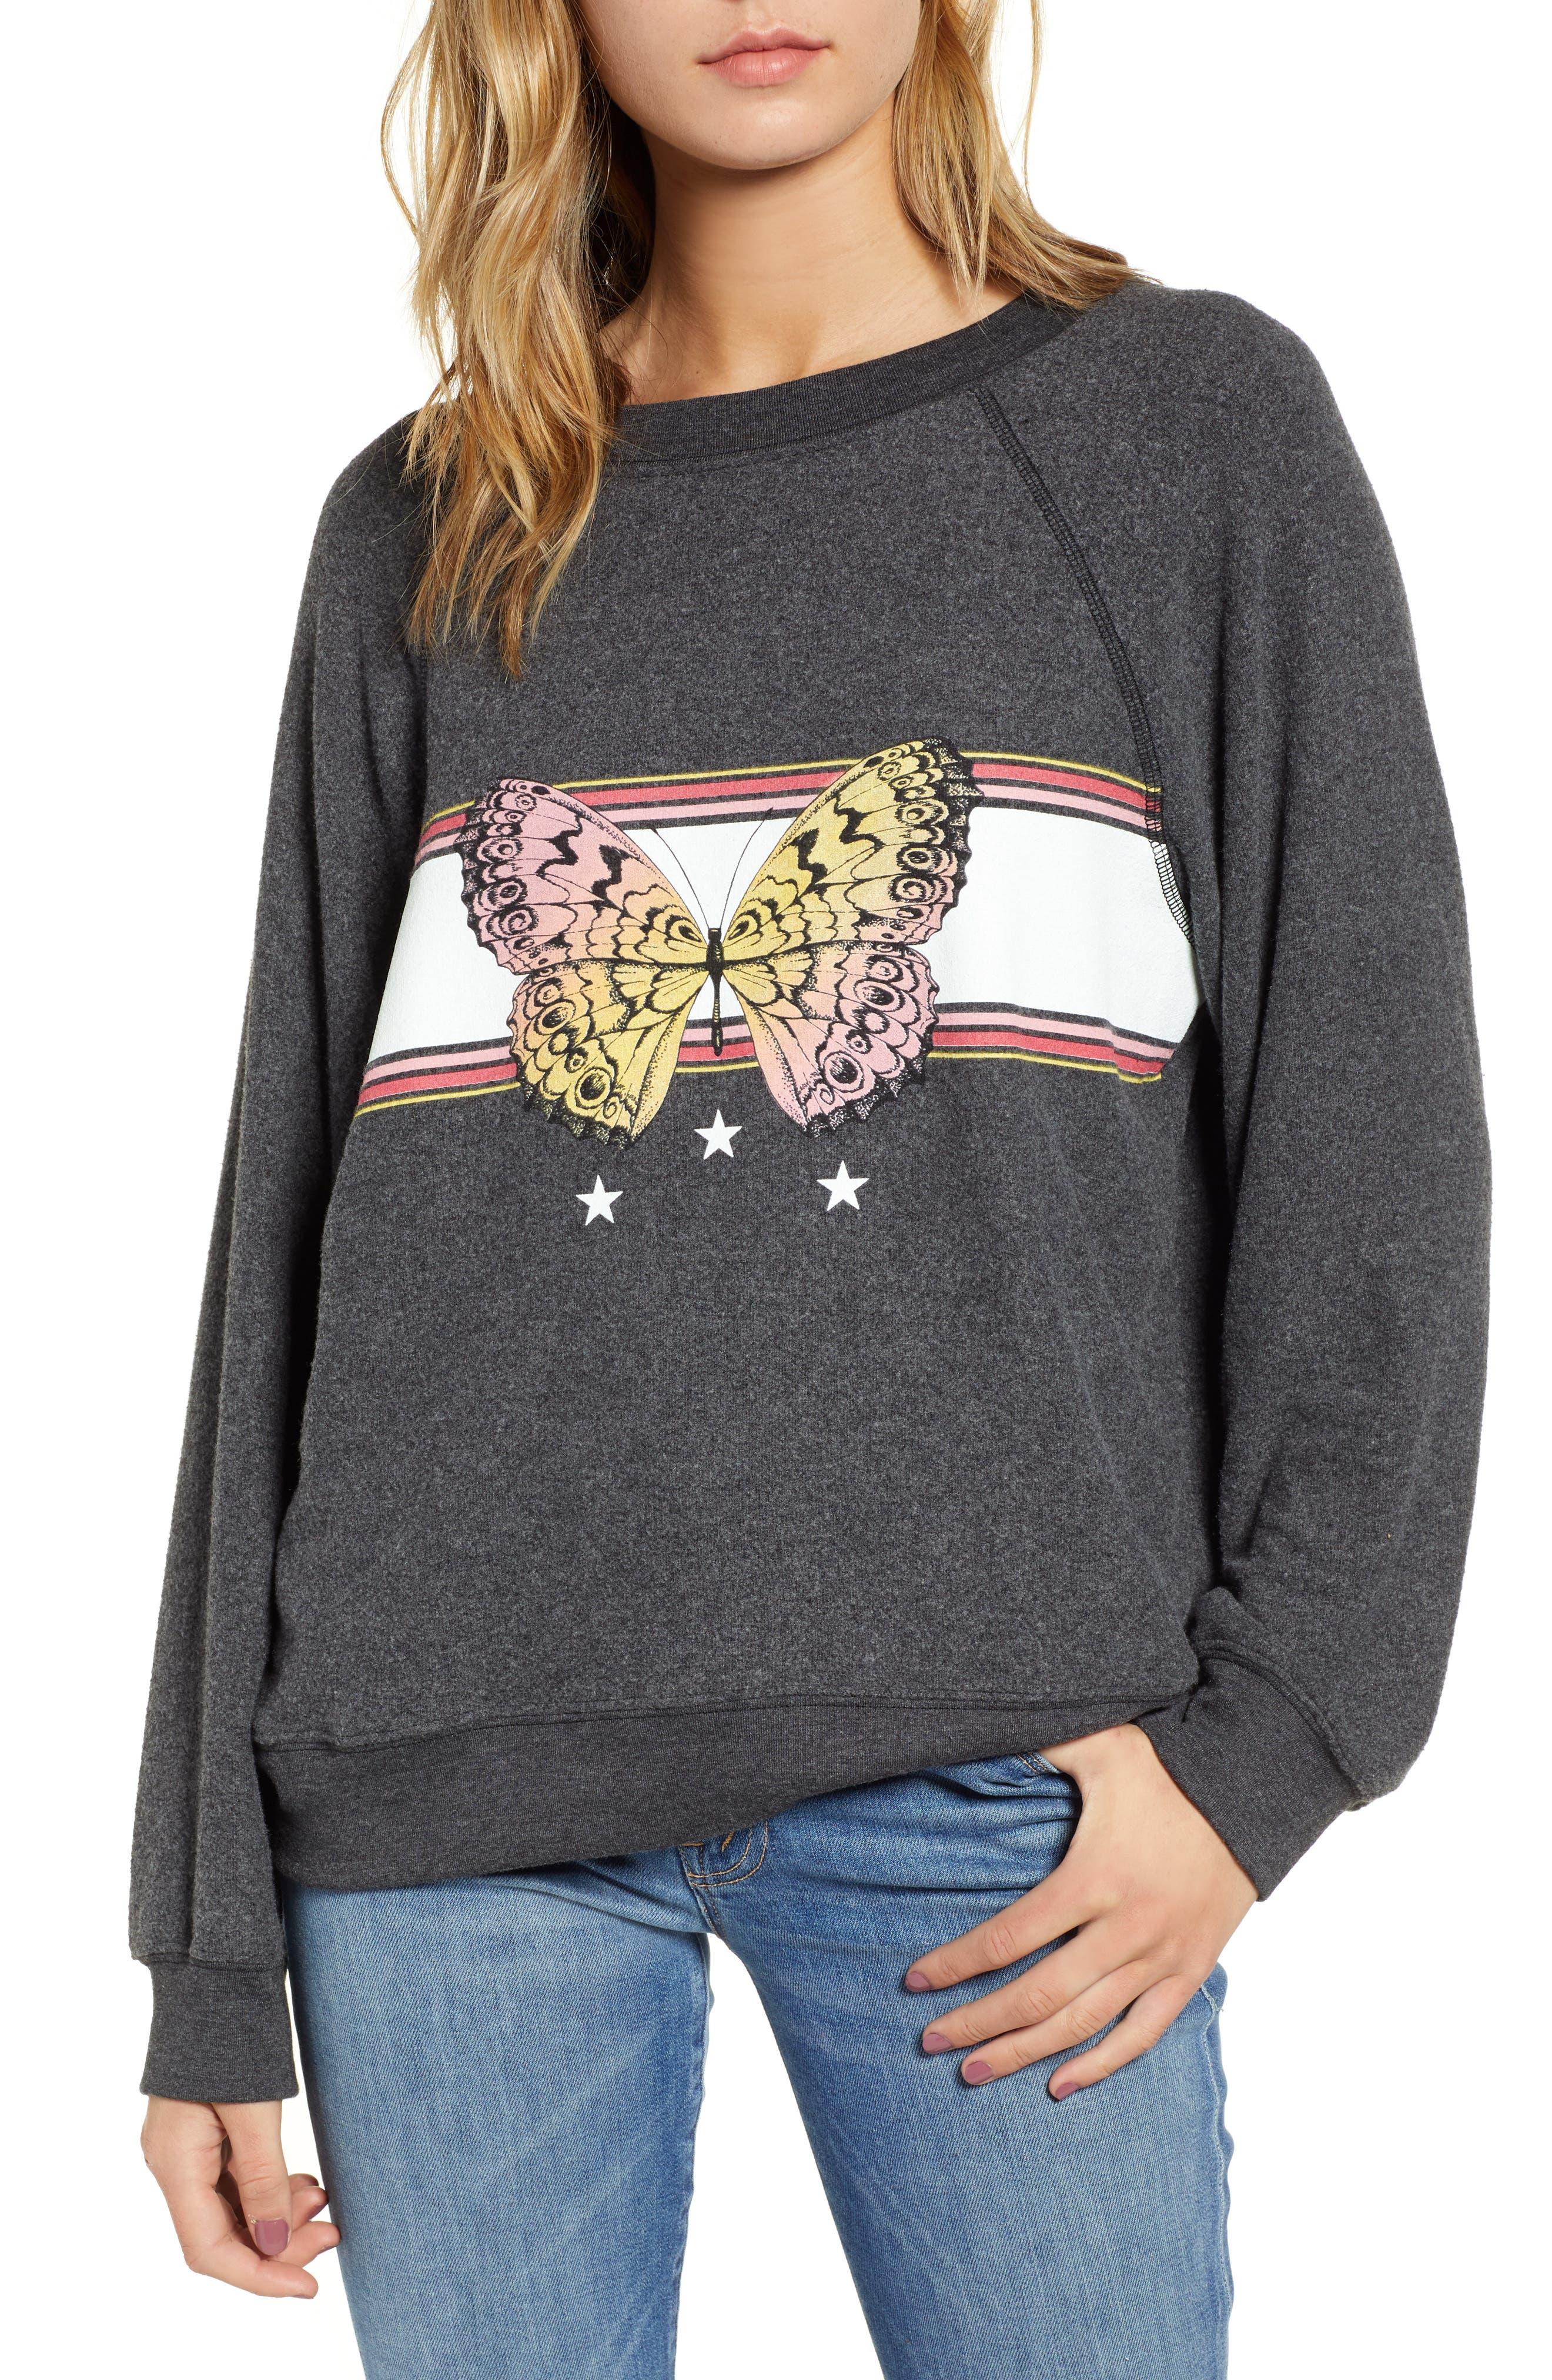 Sommers Papillion Sweatshirt,                         Main,                         color, 002